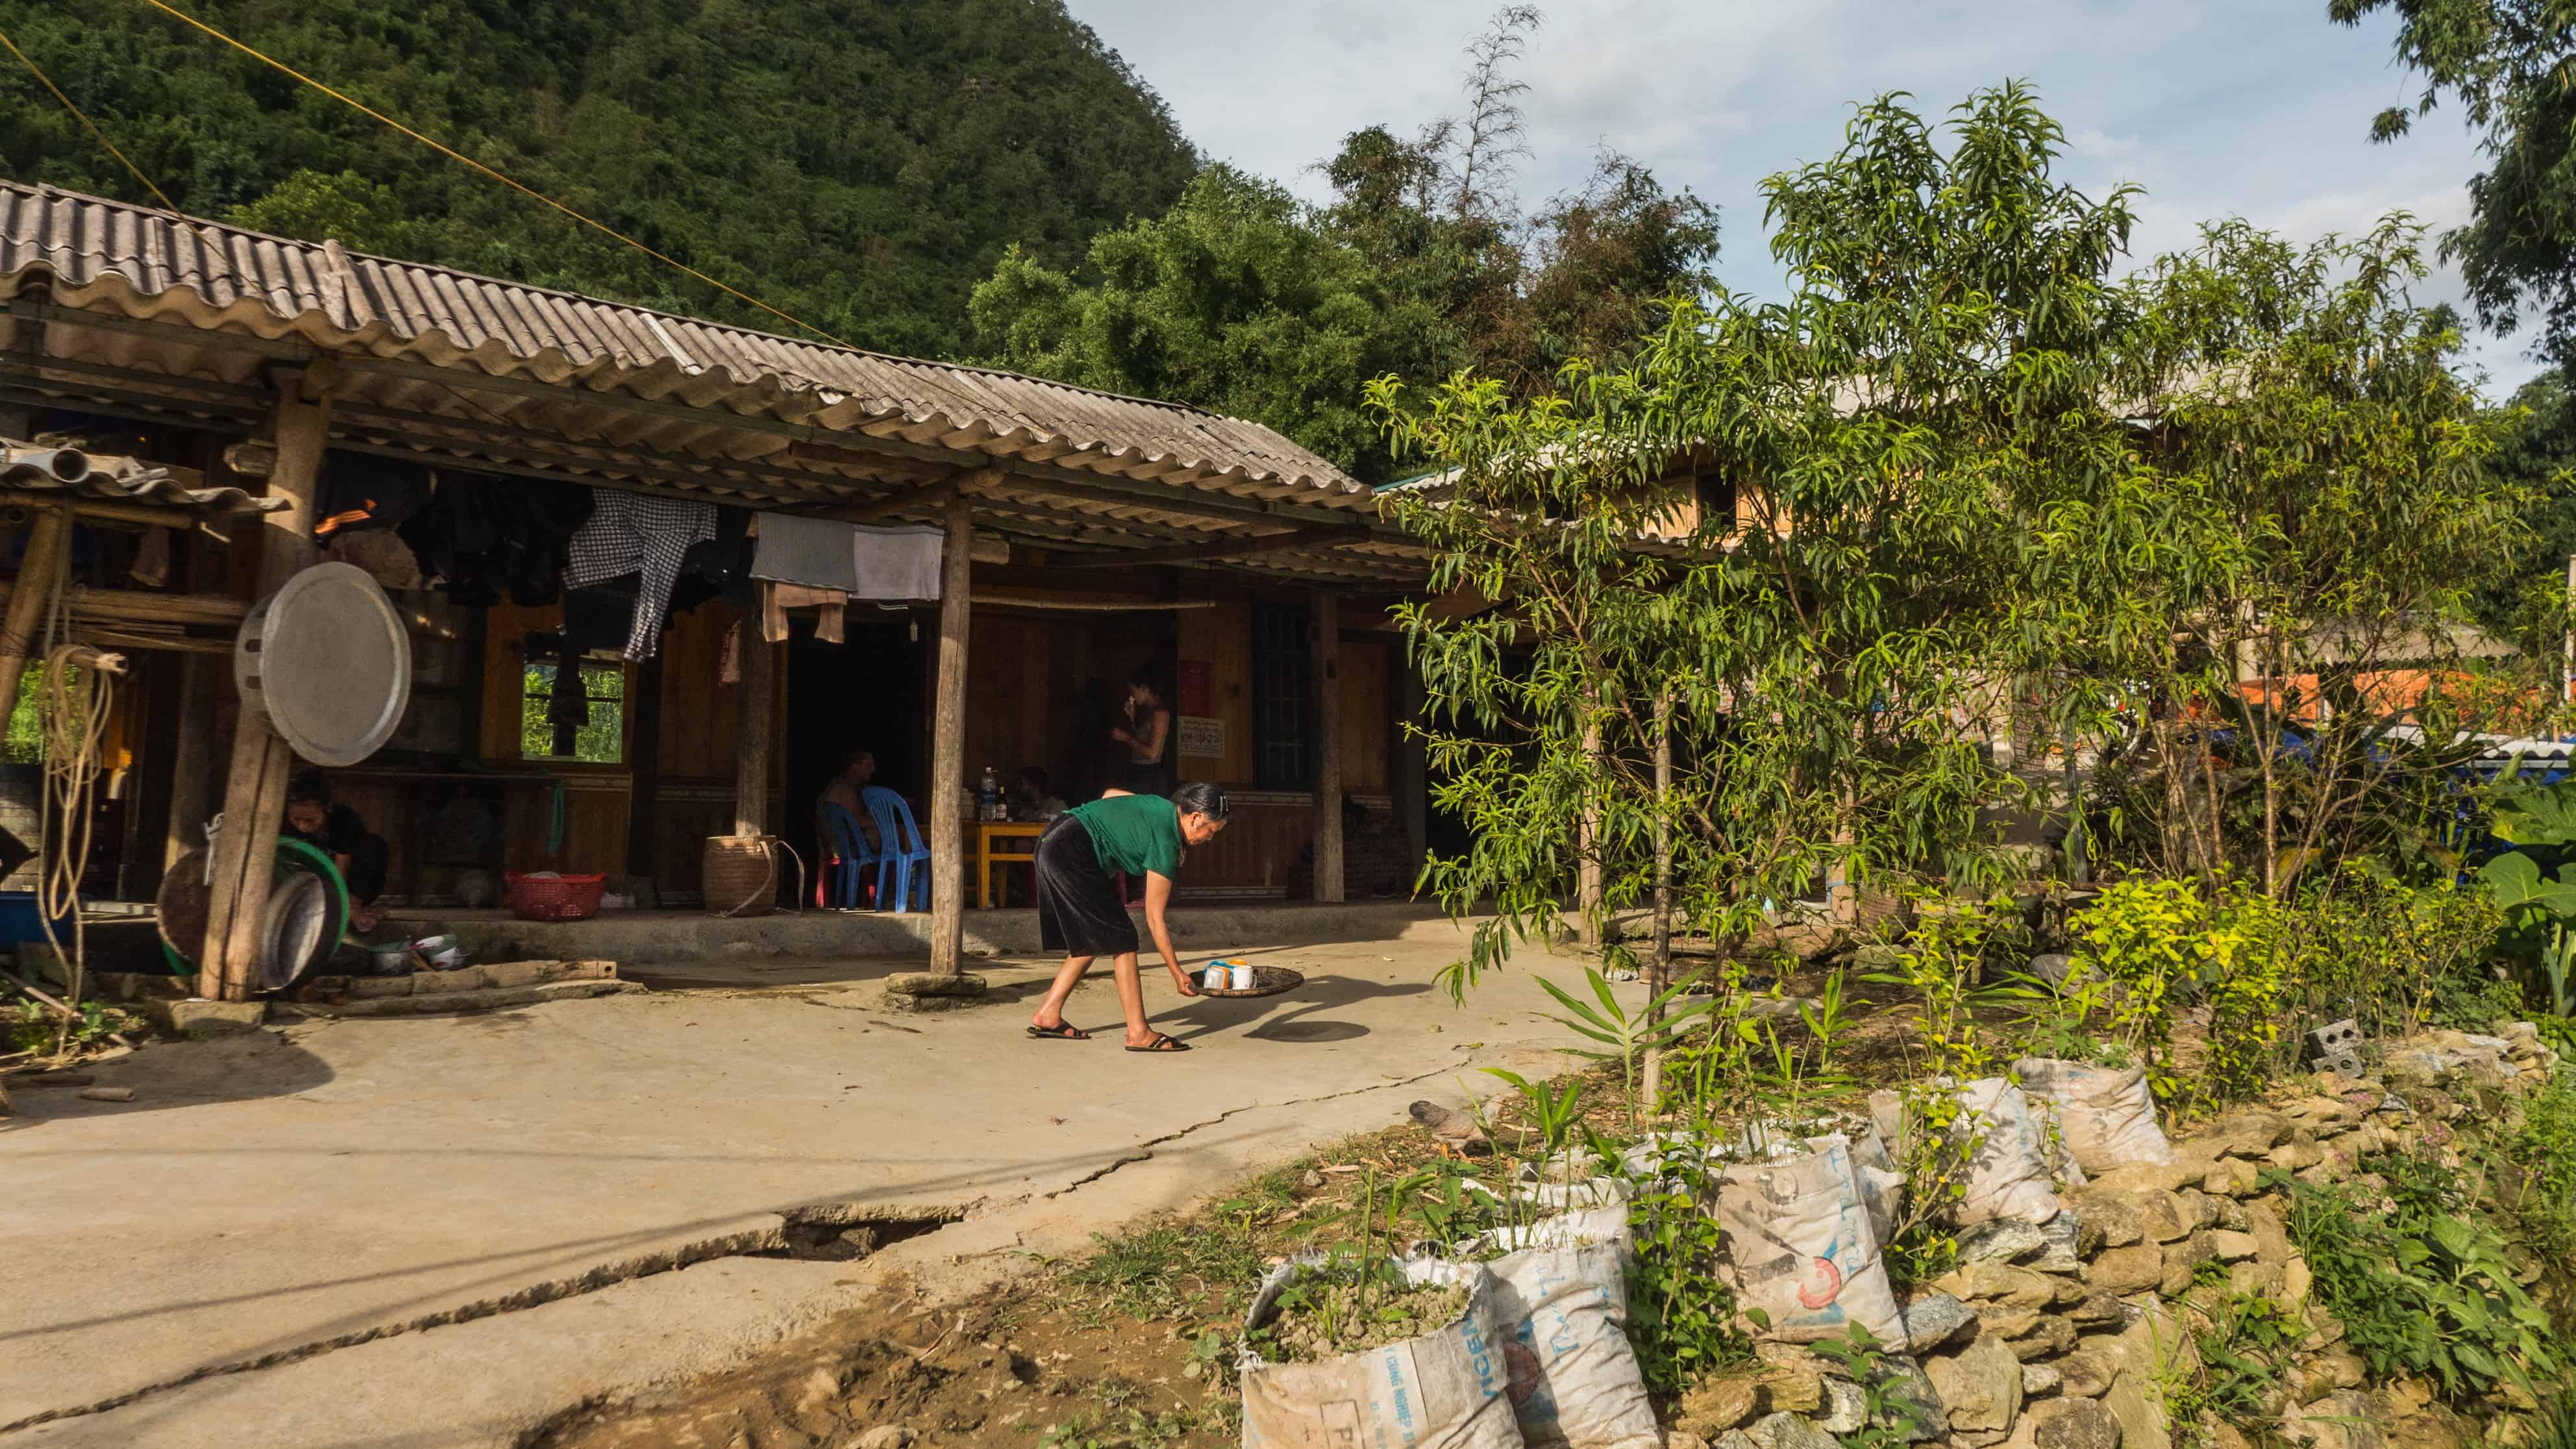 Mama Z, Hau Thao, treking